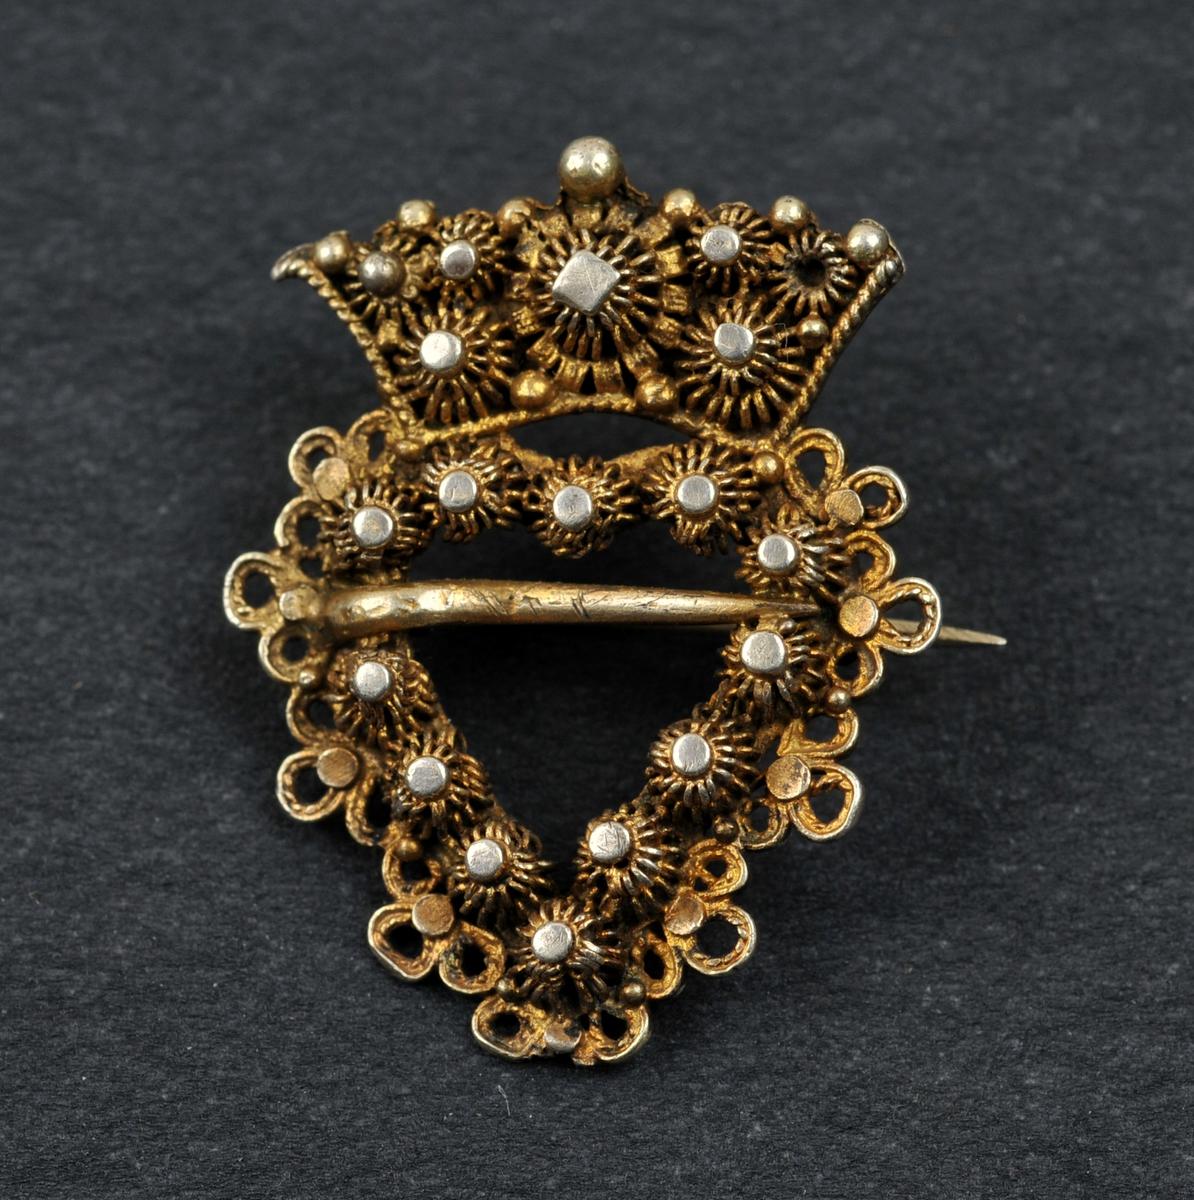 Hjarteforma sprette med krone. Filigransarbeide.